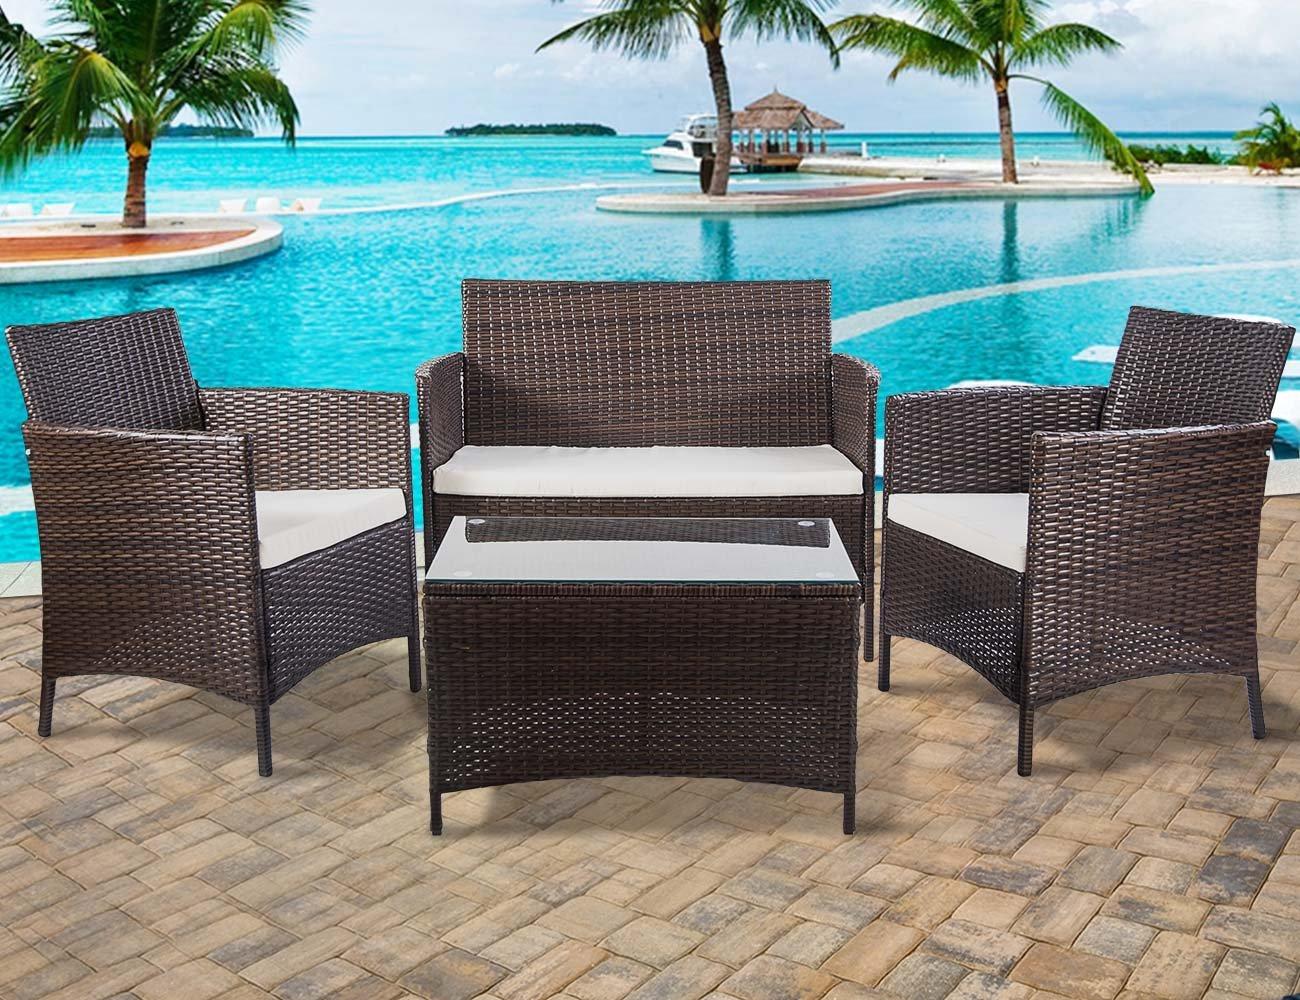 Merax 4 pcs Patio Furniture Set Outdoor Wicker Garden Furniture Set with Beige cushion (Brown)